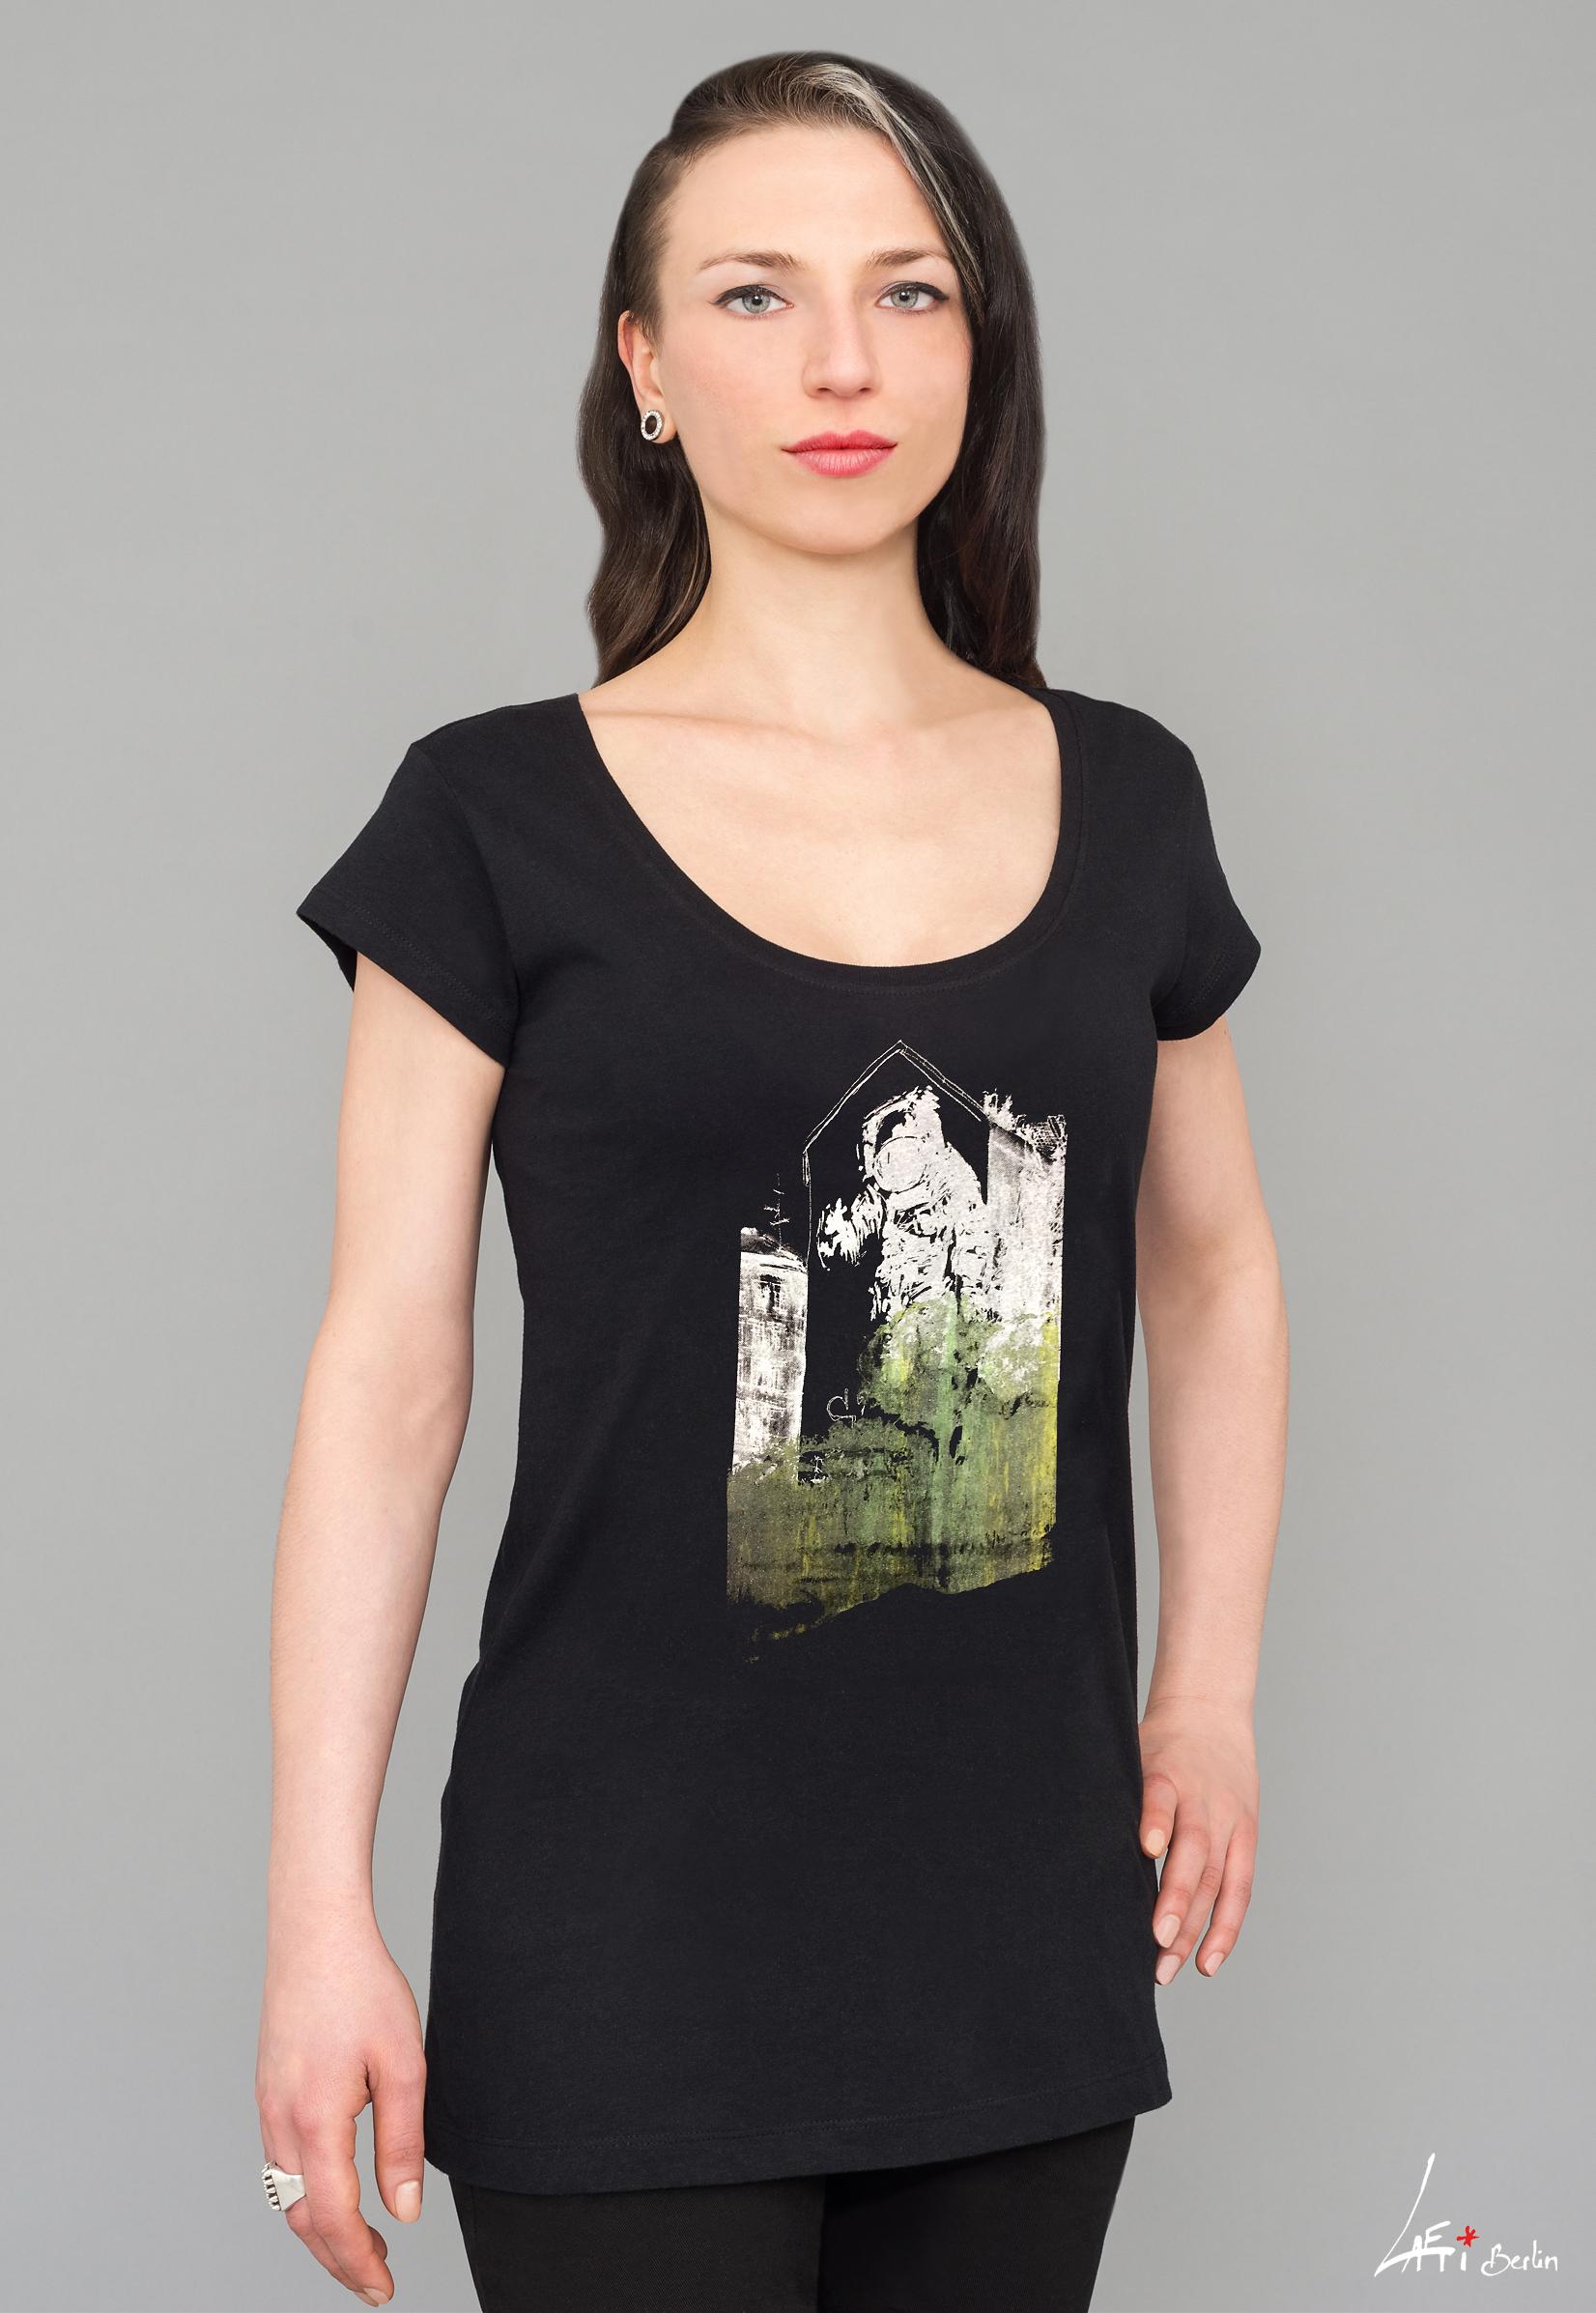 T-shirt Astronaut Kosmonaut Long black Scooped neck White Green charcoal print Woman